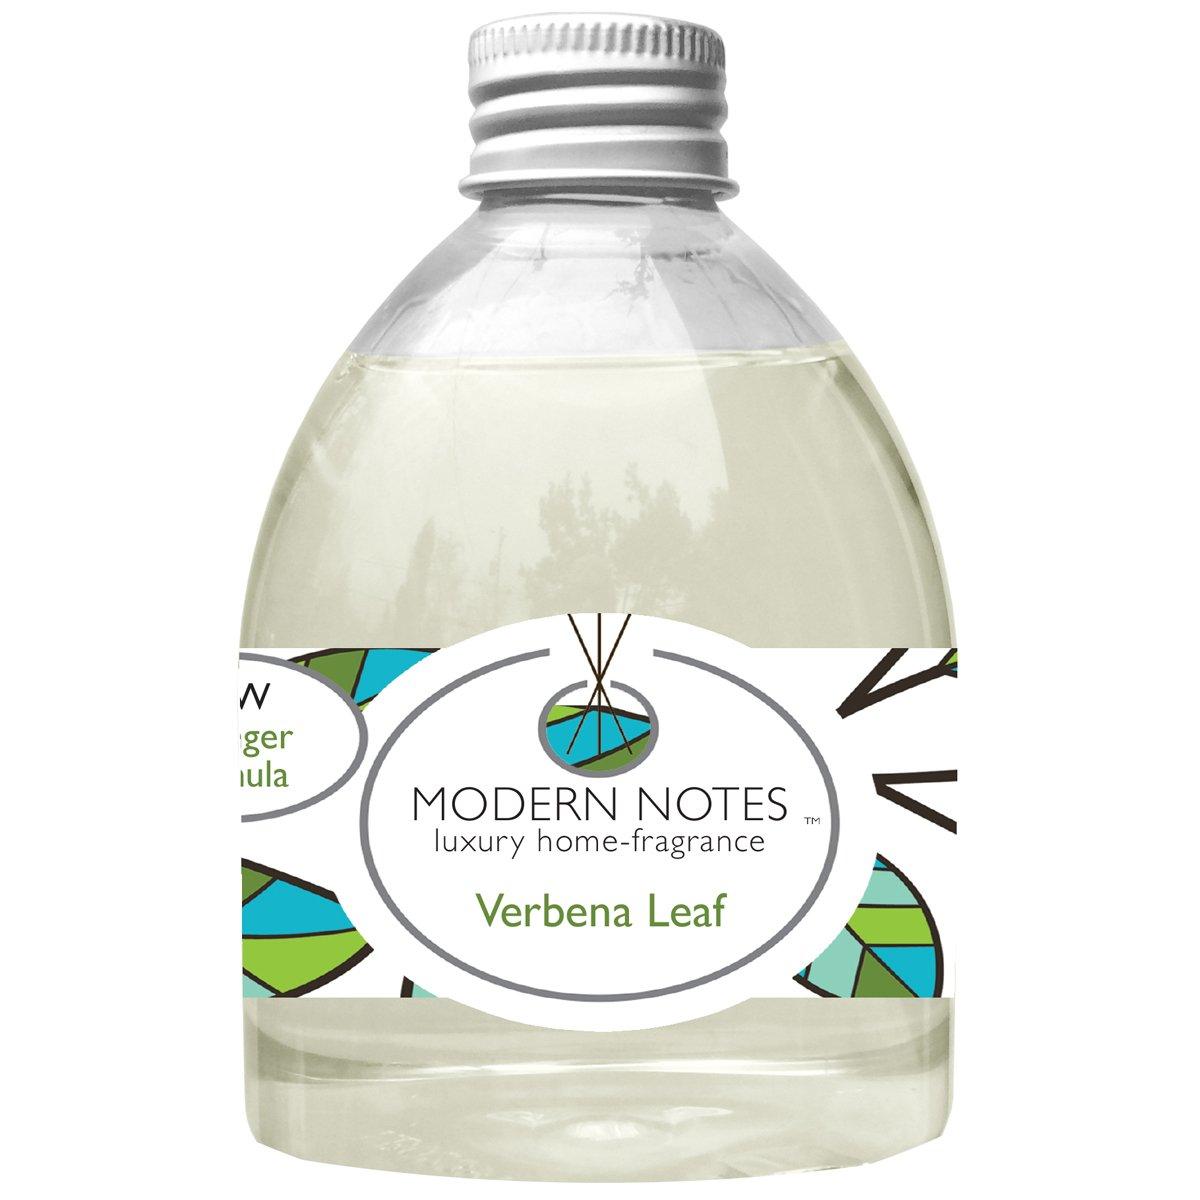 「modern notes」の画像検索結果